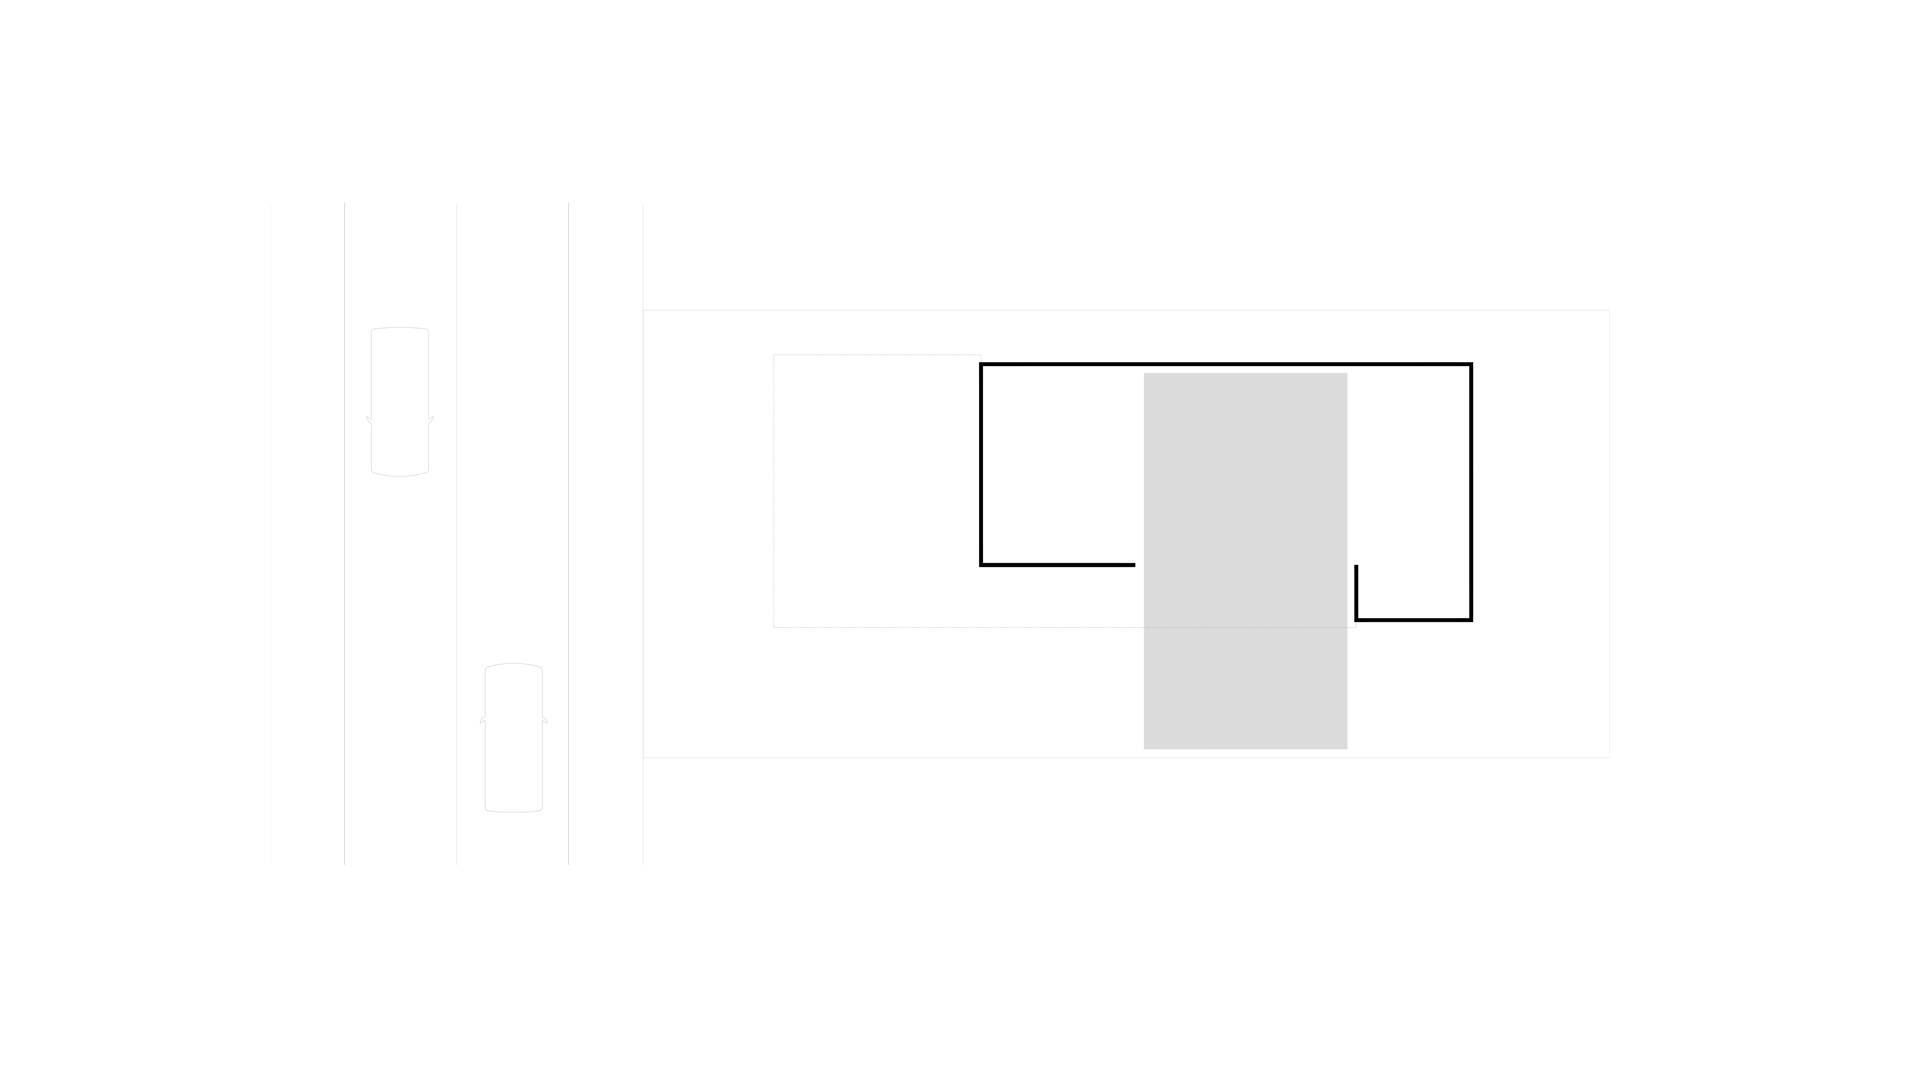 aruana-diagrama-area-externa